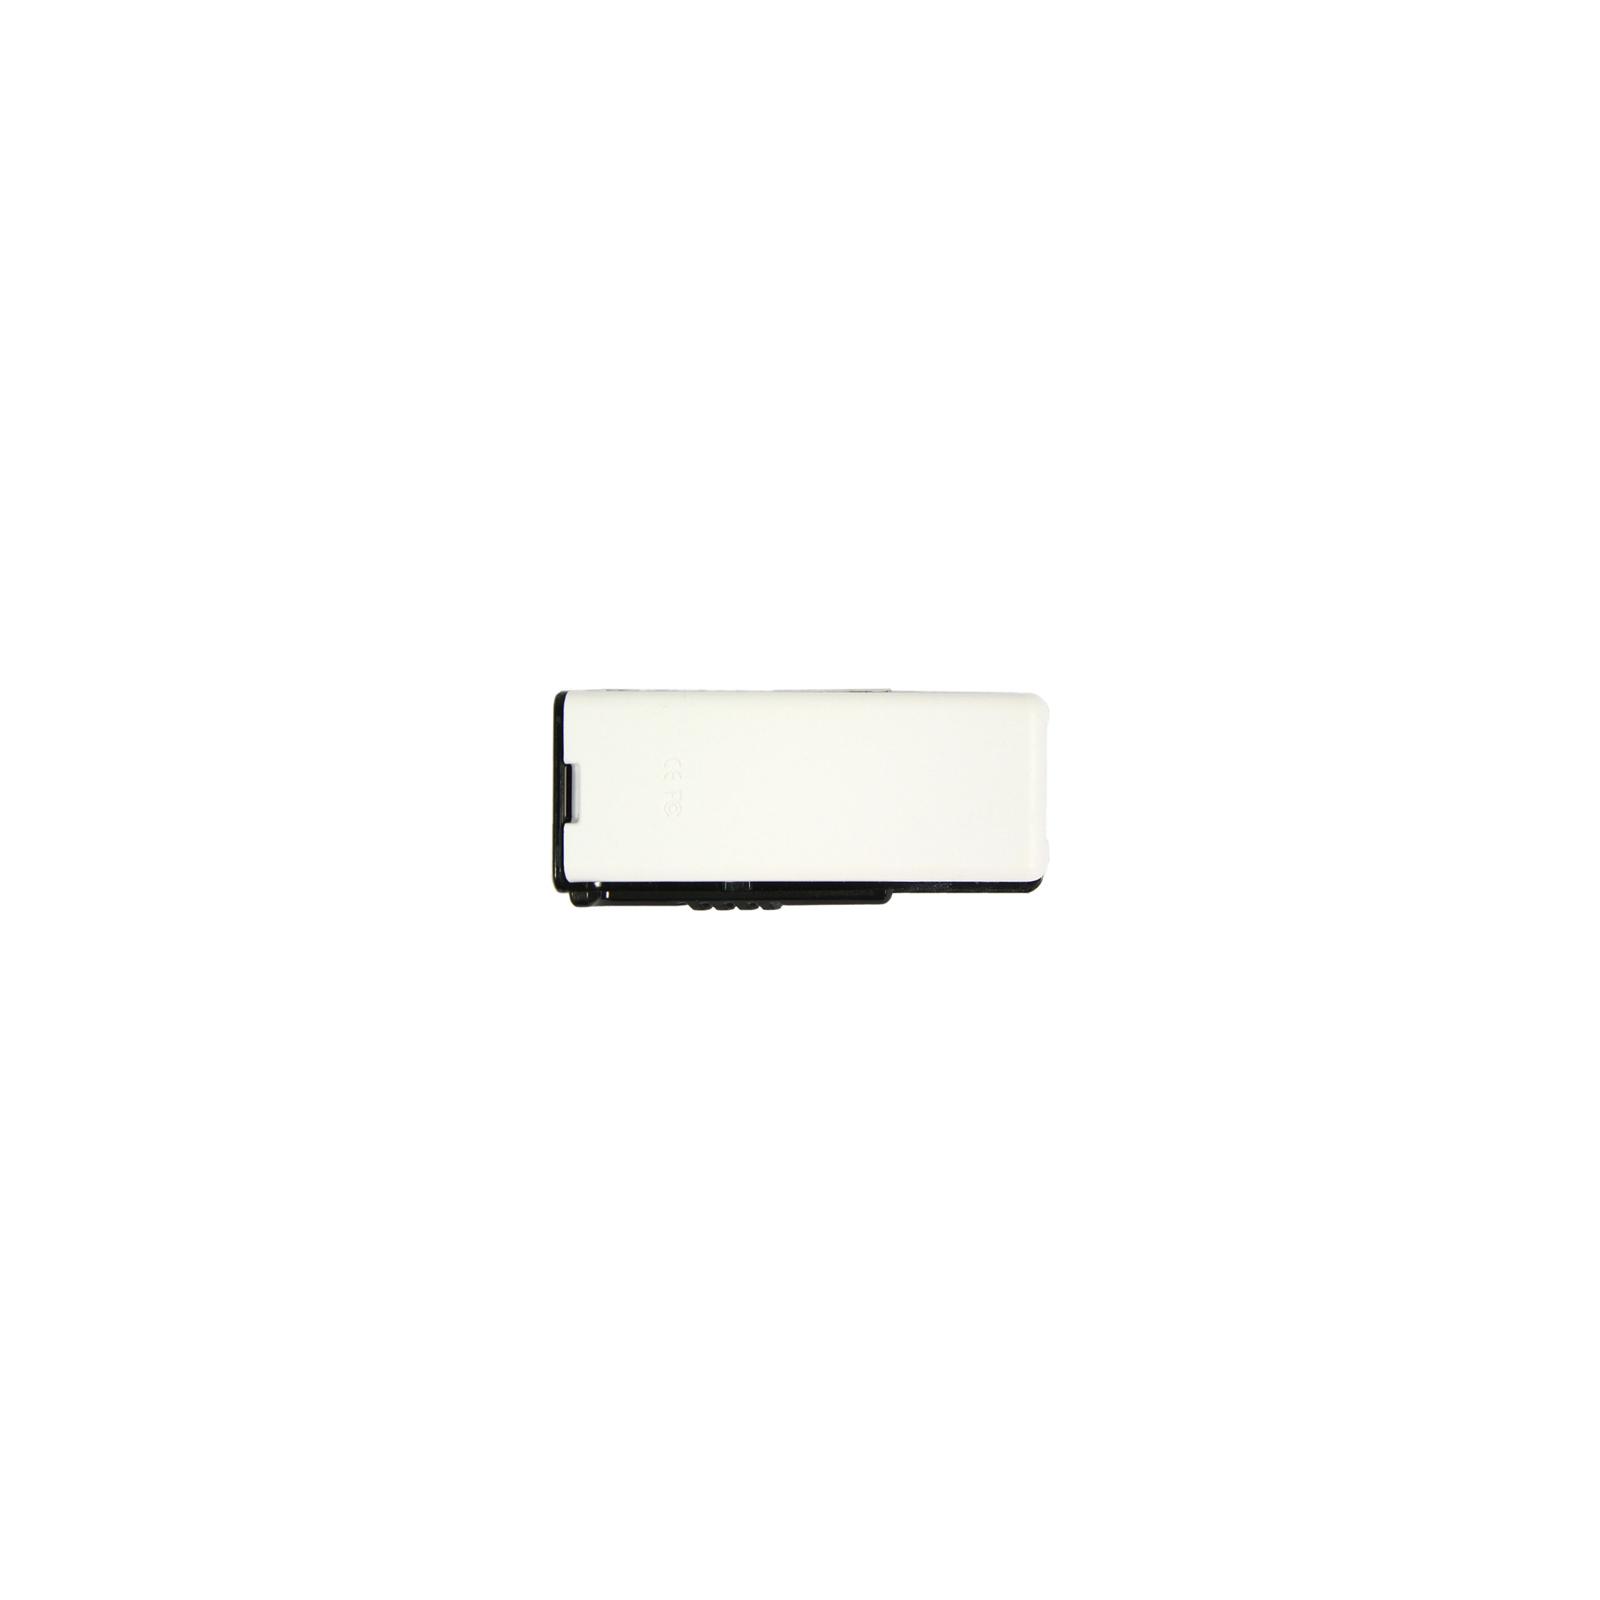 USB флеш накопитель 16GB AH350 Black RP USB3.0 Apacer (AP16GAH350B-1) изображение 2